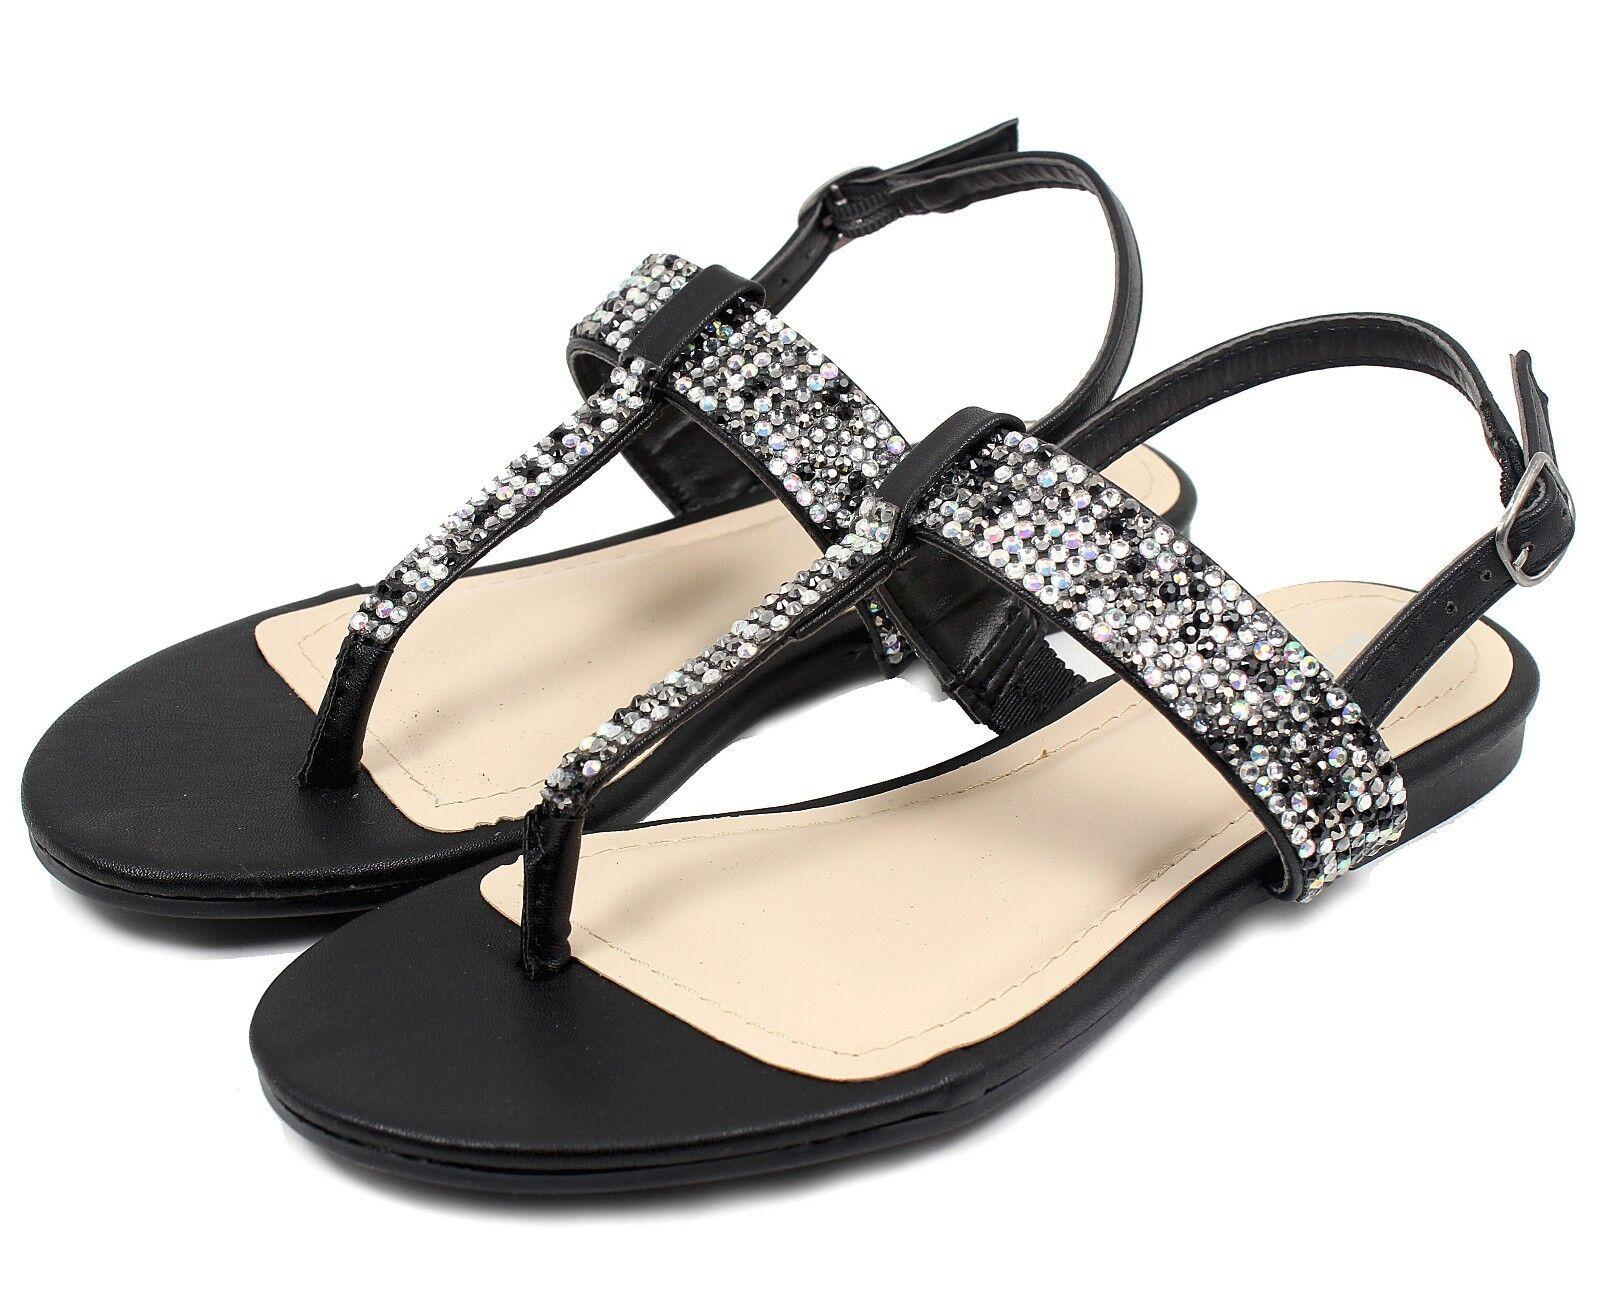 JOSALYN-22 Fushion Women Bead Flat T-Strap Cute Sandals Party Women Fushion Shoes Black 6.5 5a4fd7